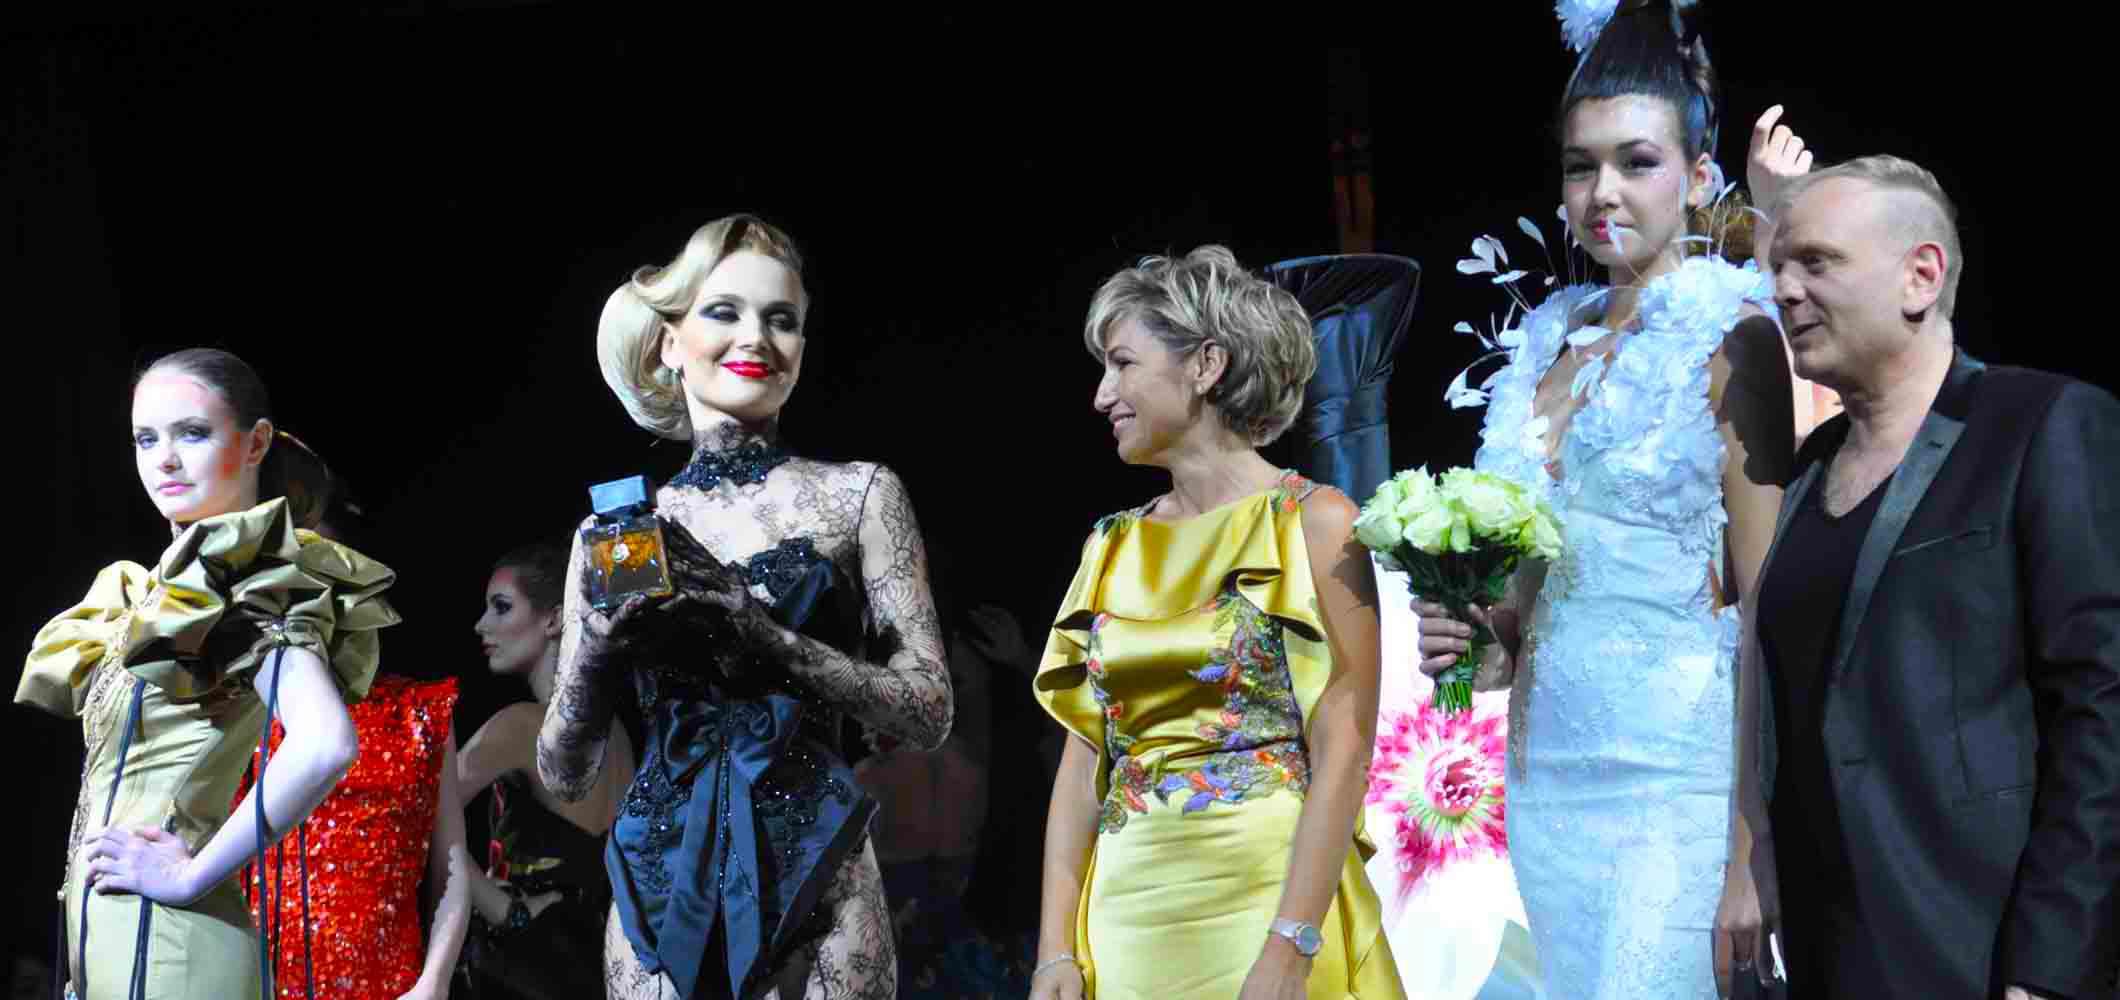 Denis Durand Fashion Show and Perfume